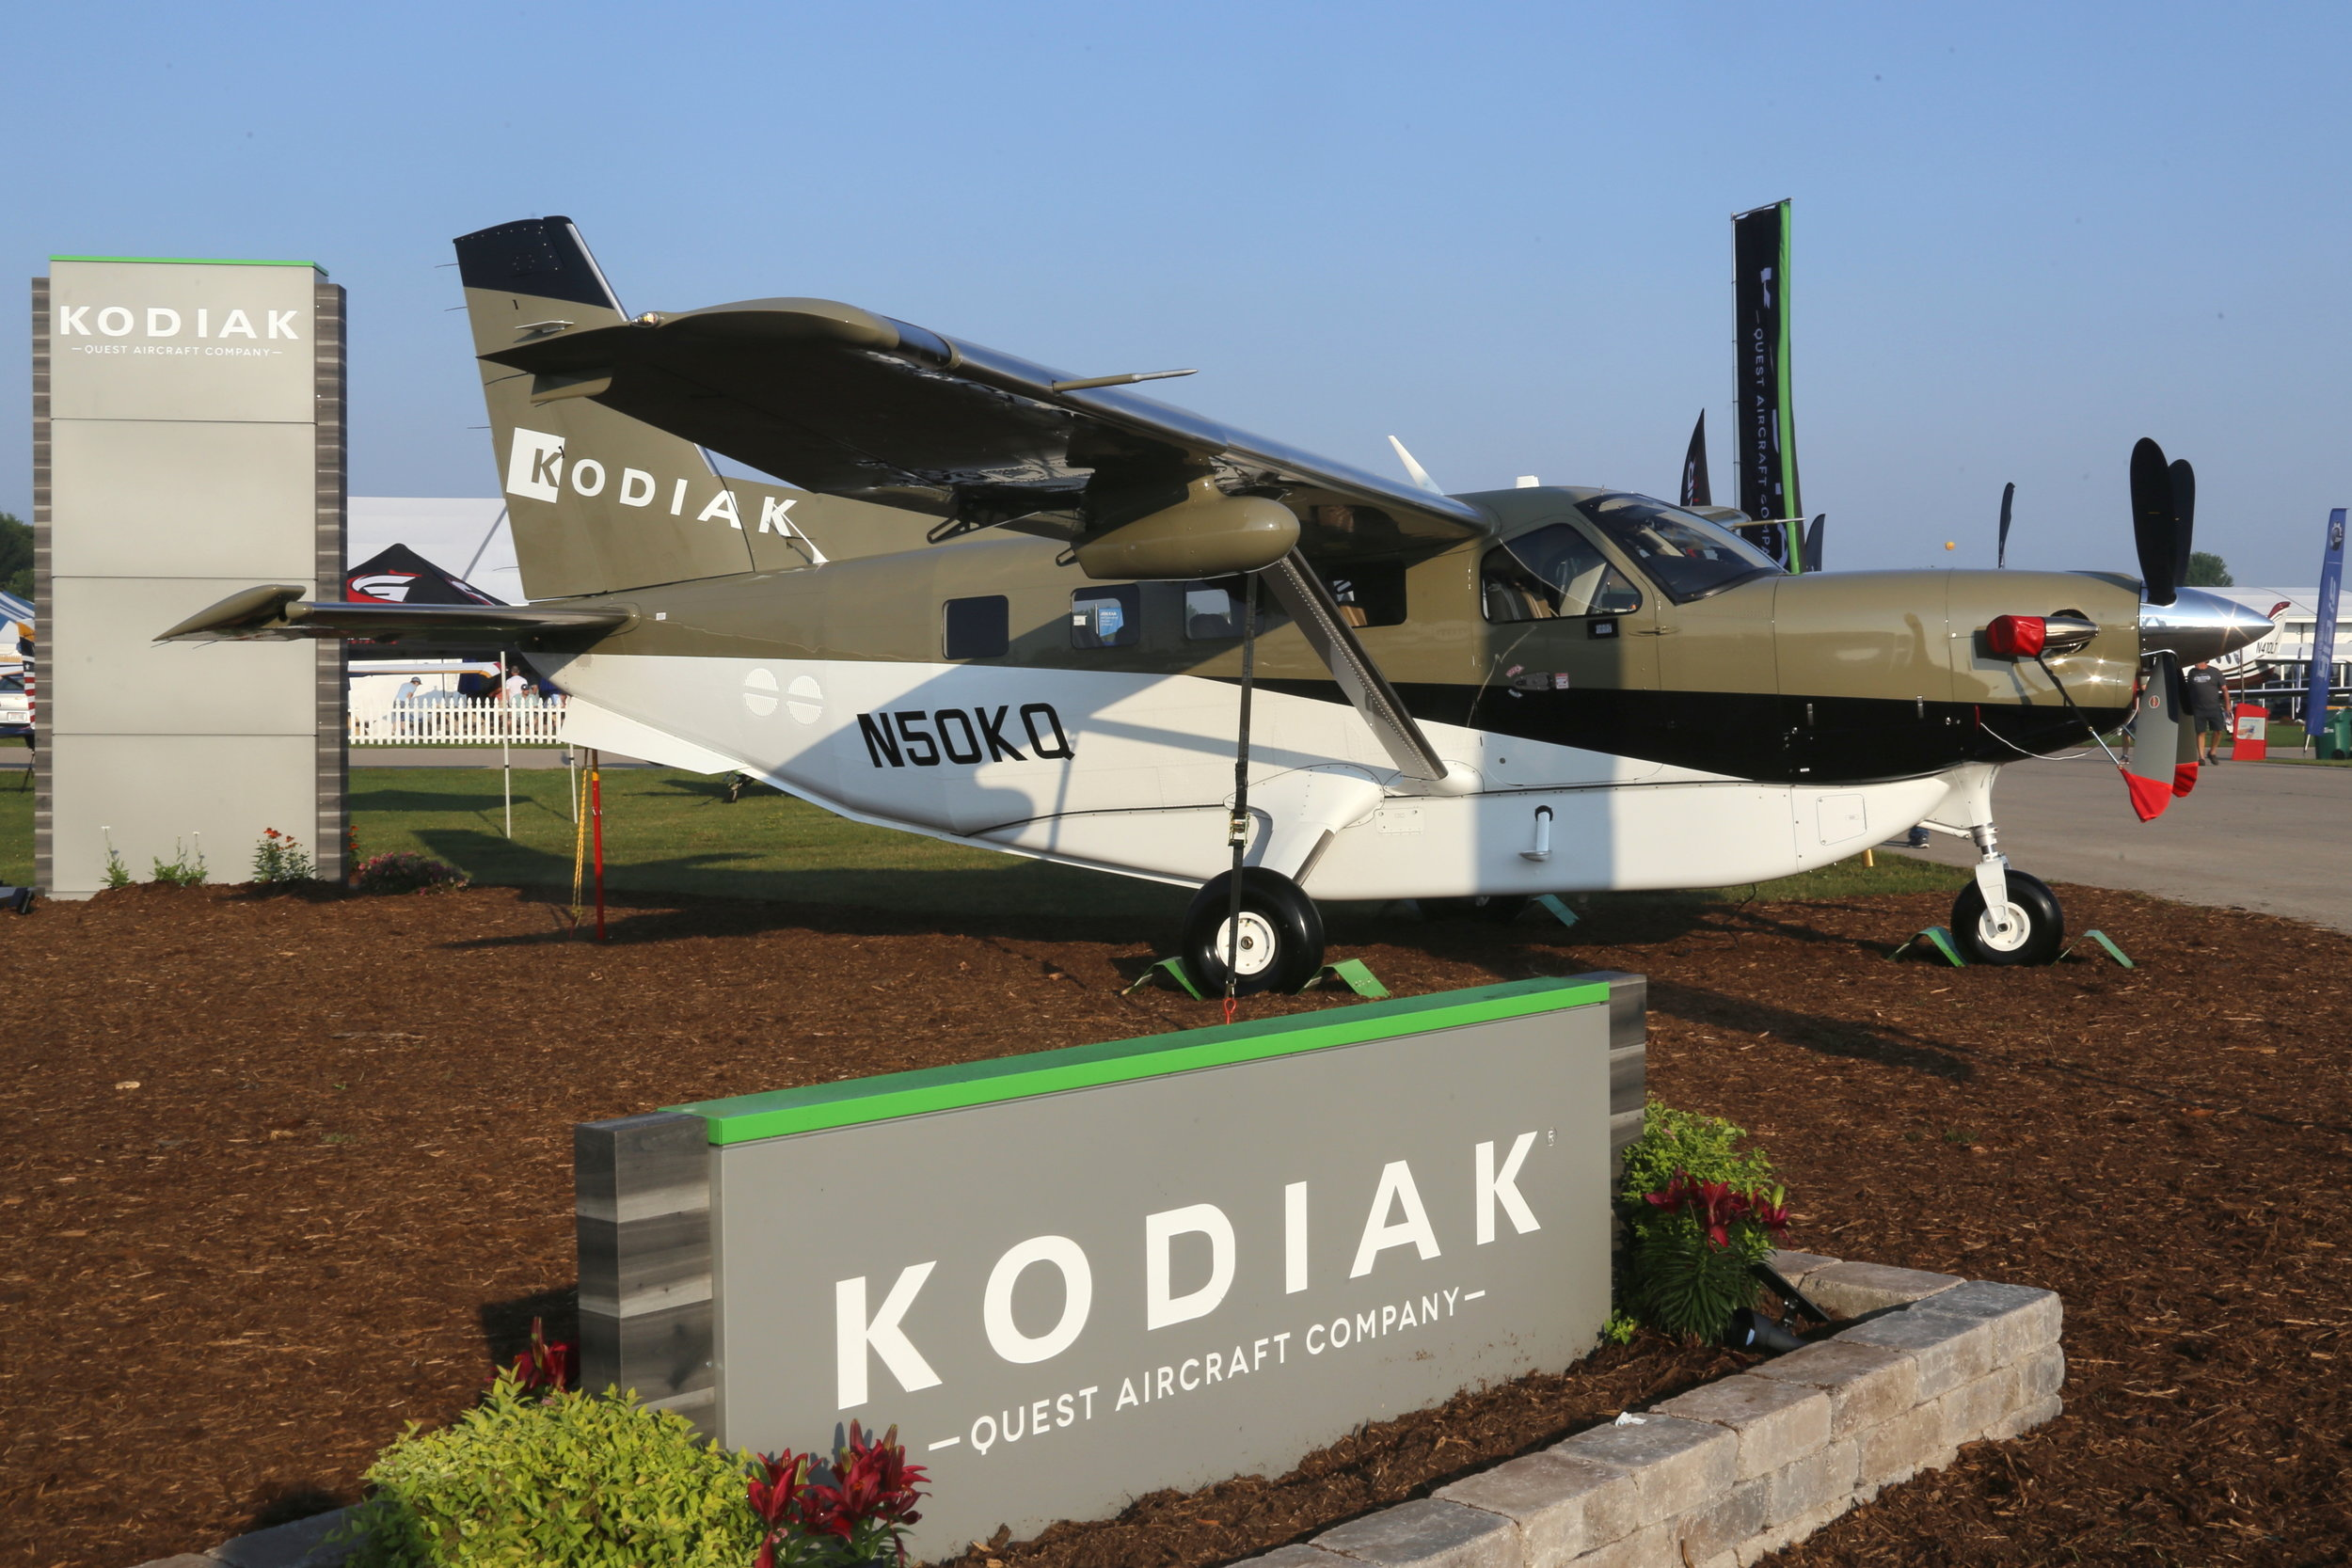 N50KQ Quest Aircraft Company Kodiak 100 taken at Oshkosh 24th July 2018 by John Wood